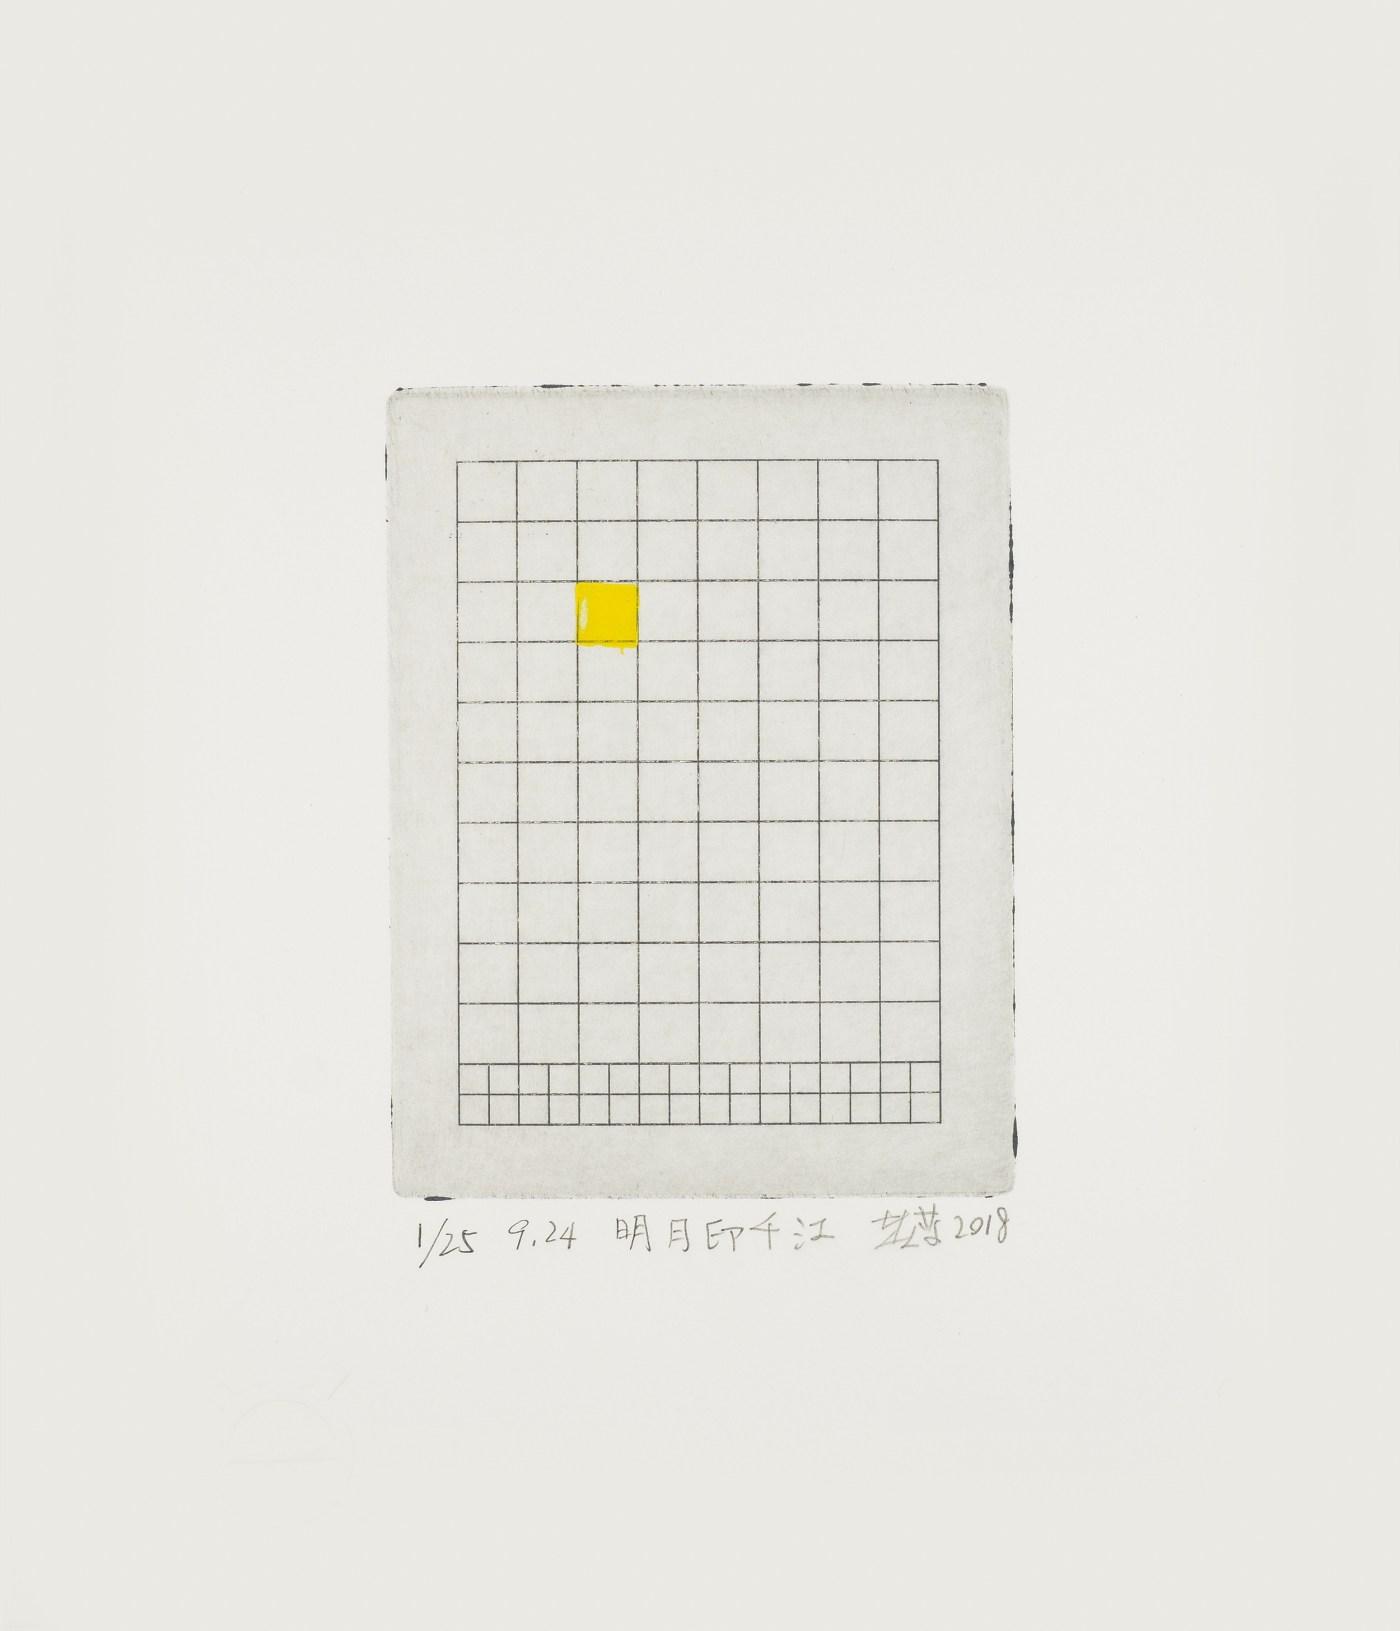 莊普,明月印千江,2018,壓克力顏料/紙,27.8 x 23. Courtesy of the artist and 誠品畫廊 ESLITE GALLERY